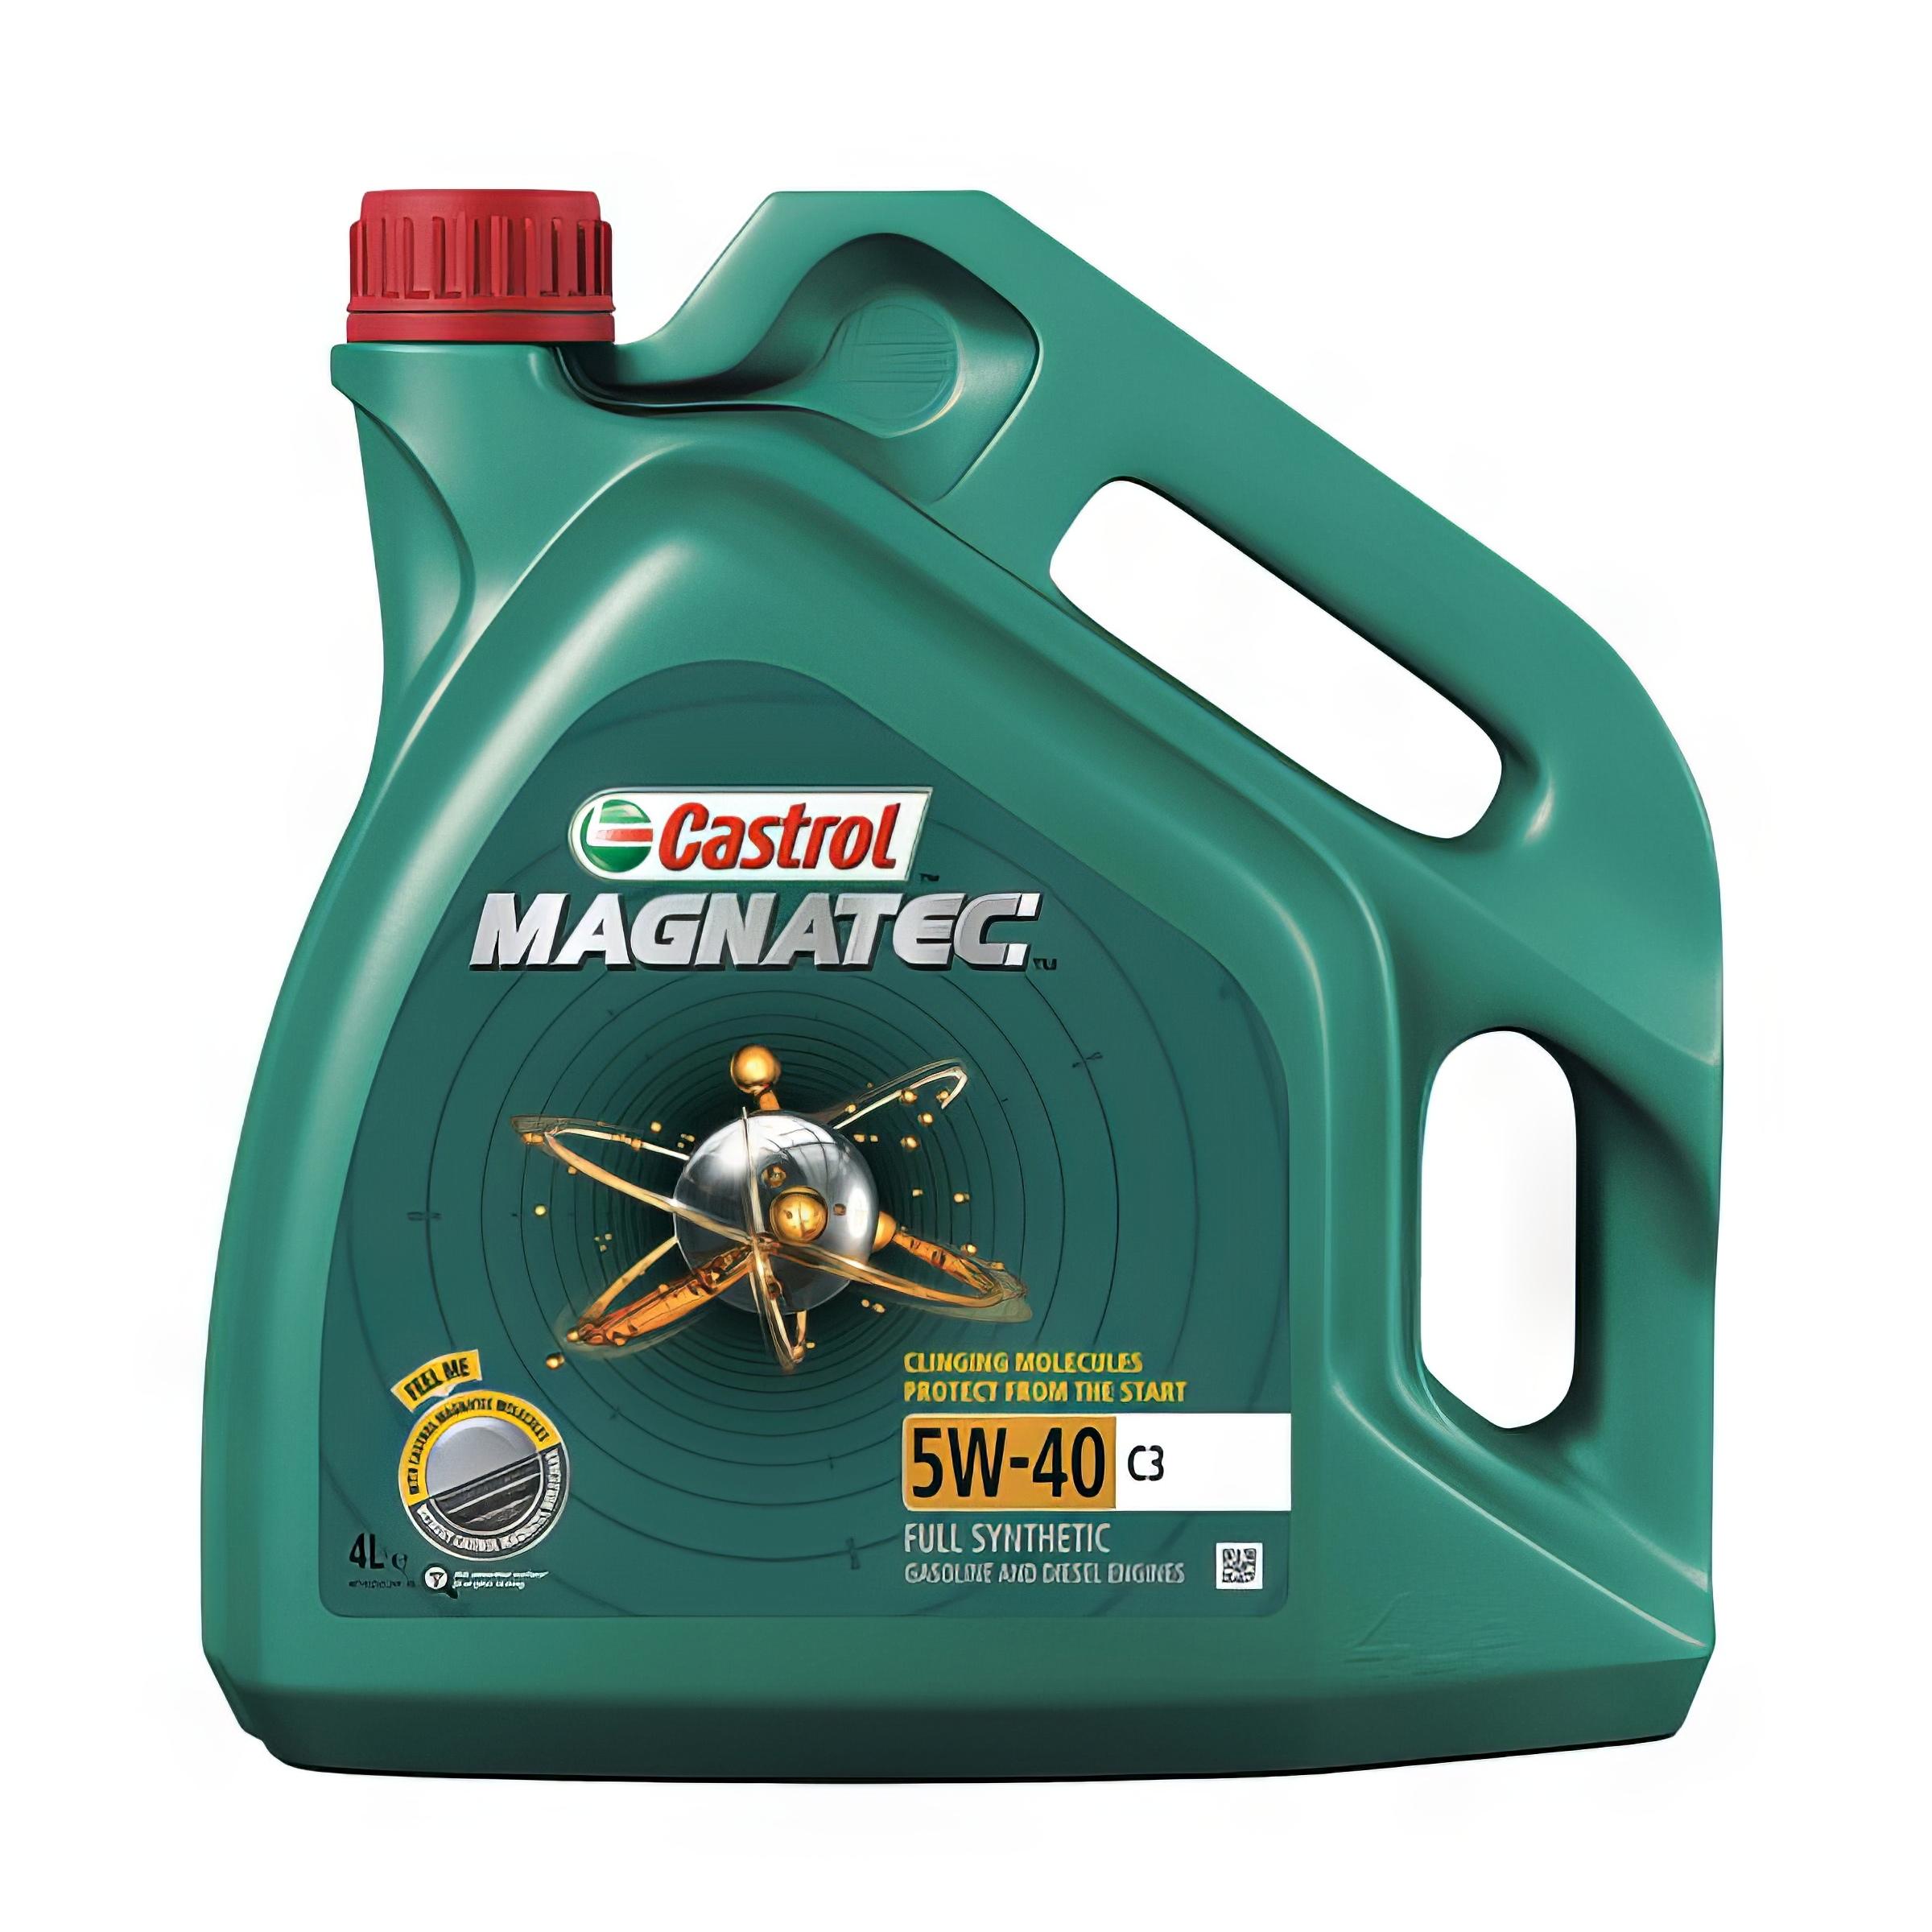 4L Car Engine Oil 4 Litres 5W40 C3 Fully Synthetic dexos2 Spec Castrol Magnatec